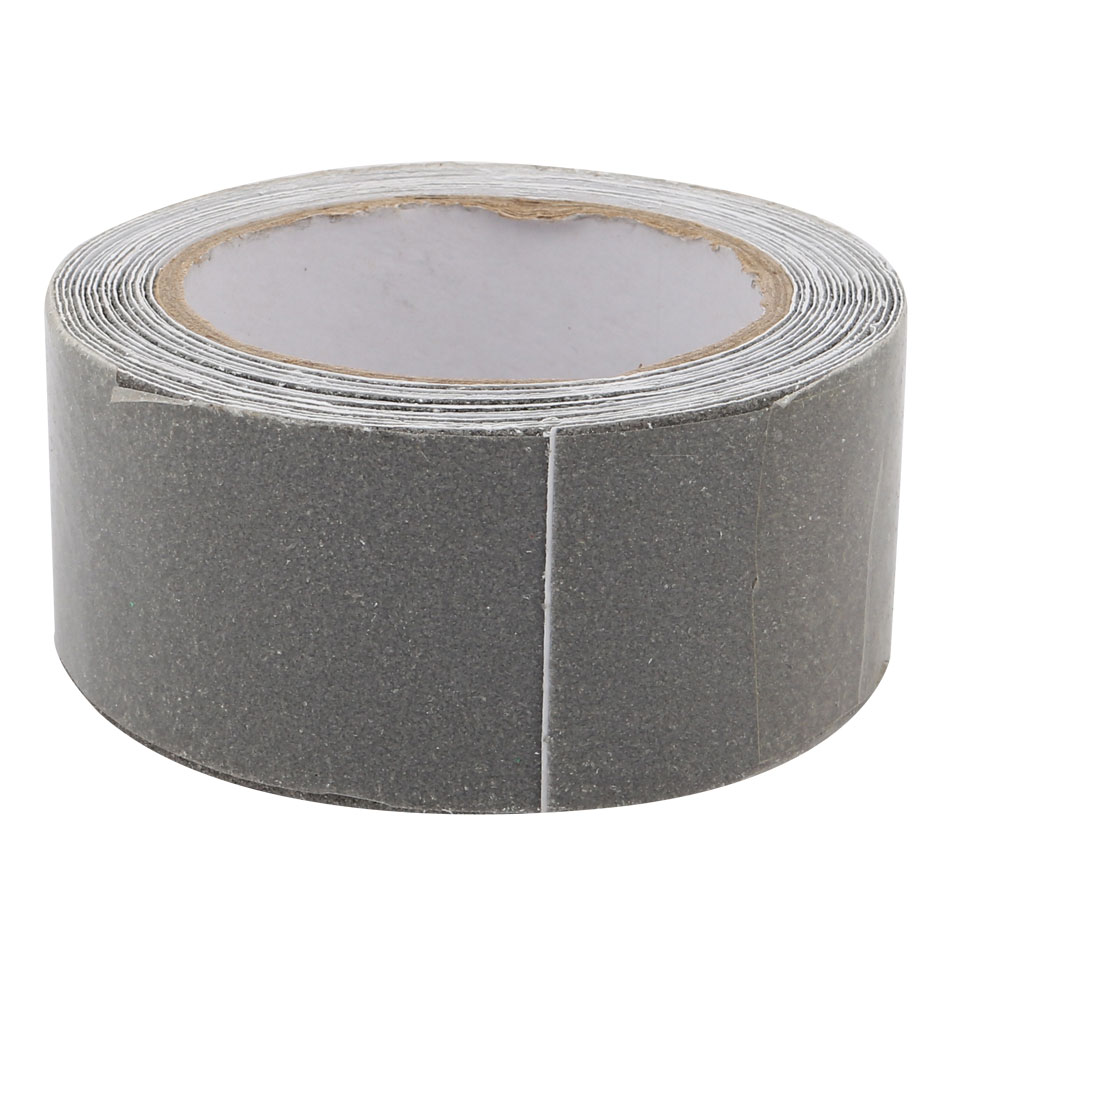 Unique Bargains 5M Long 5cm Width Adhesive Grit Anti Slip Tape for Stairs Floor Dark Gray - image 2 de 3